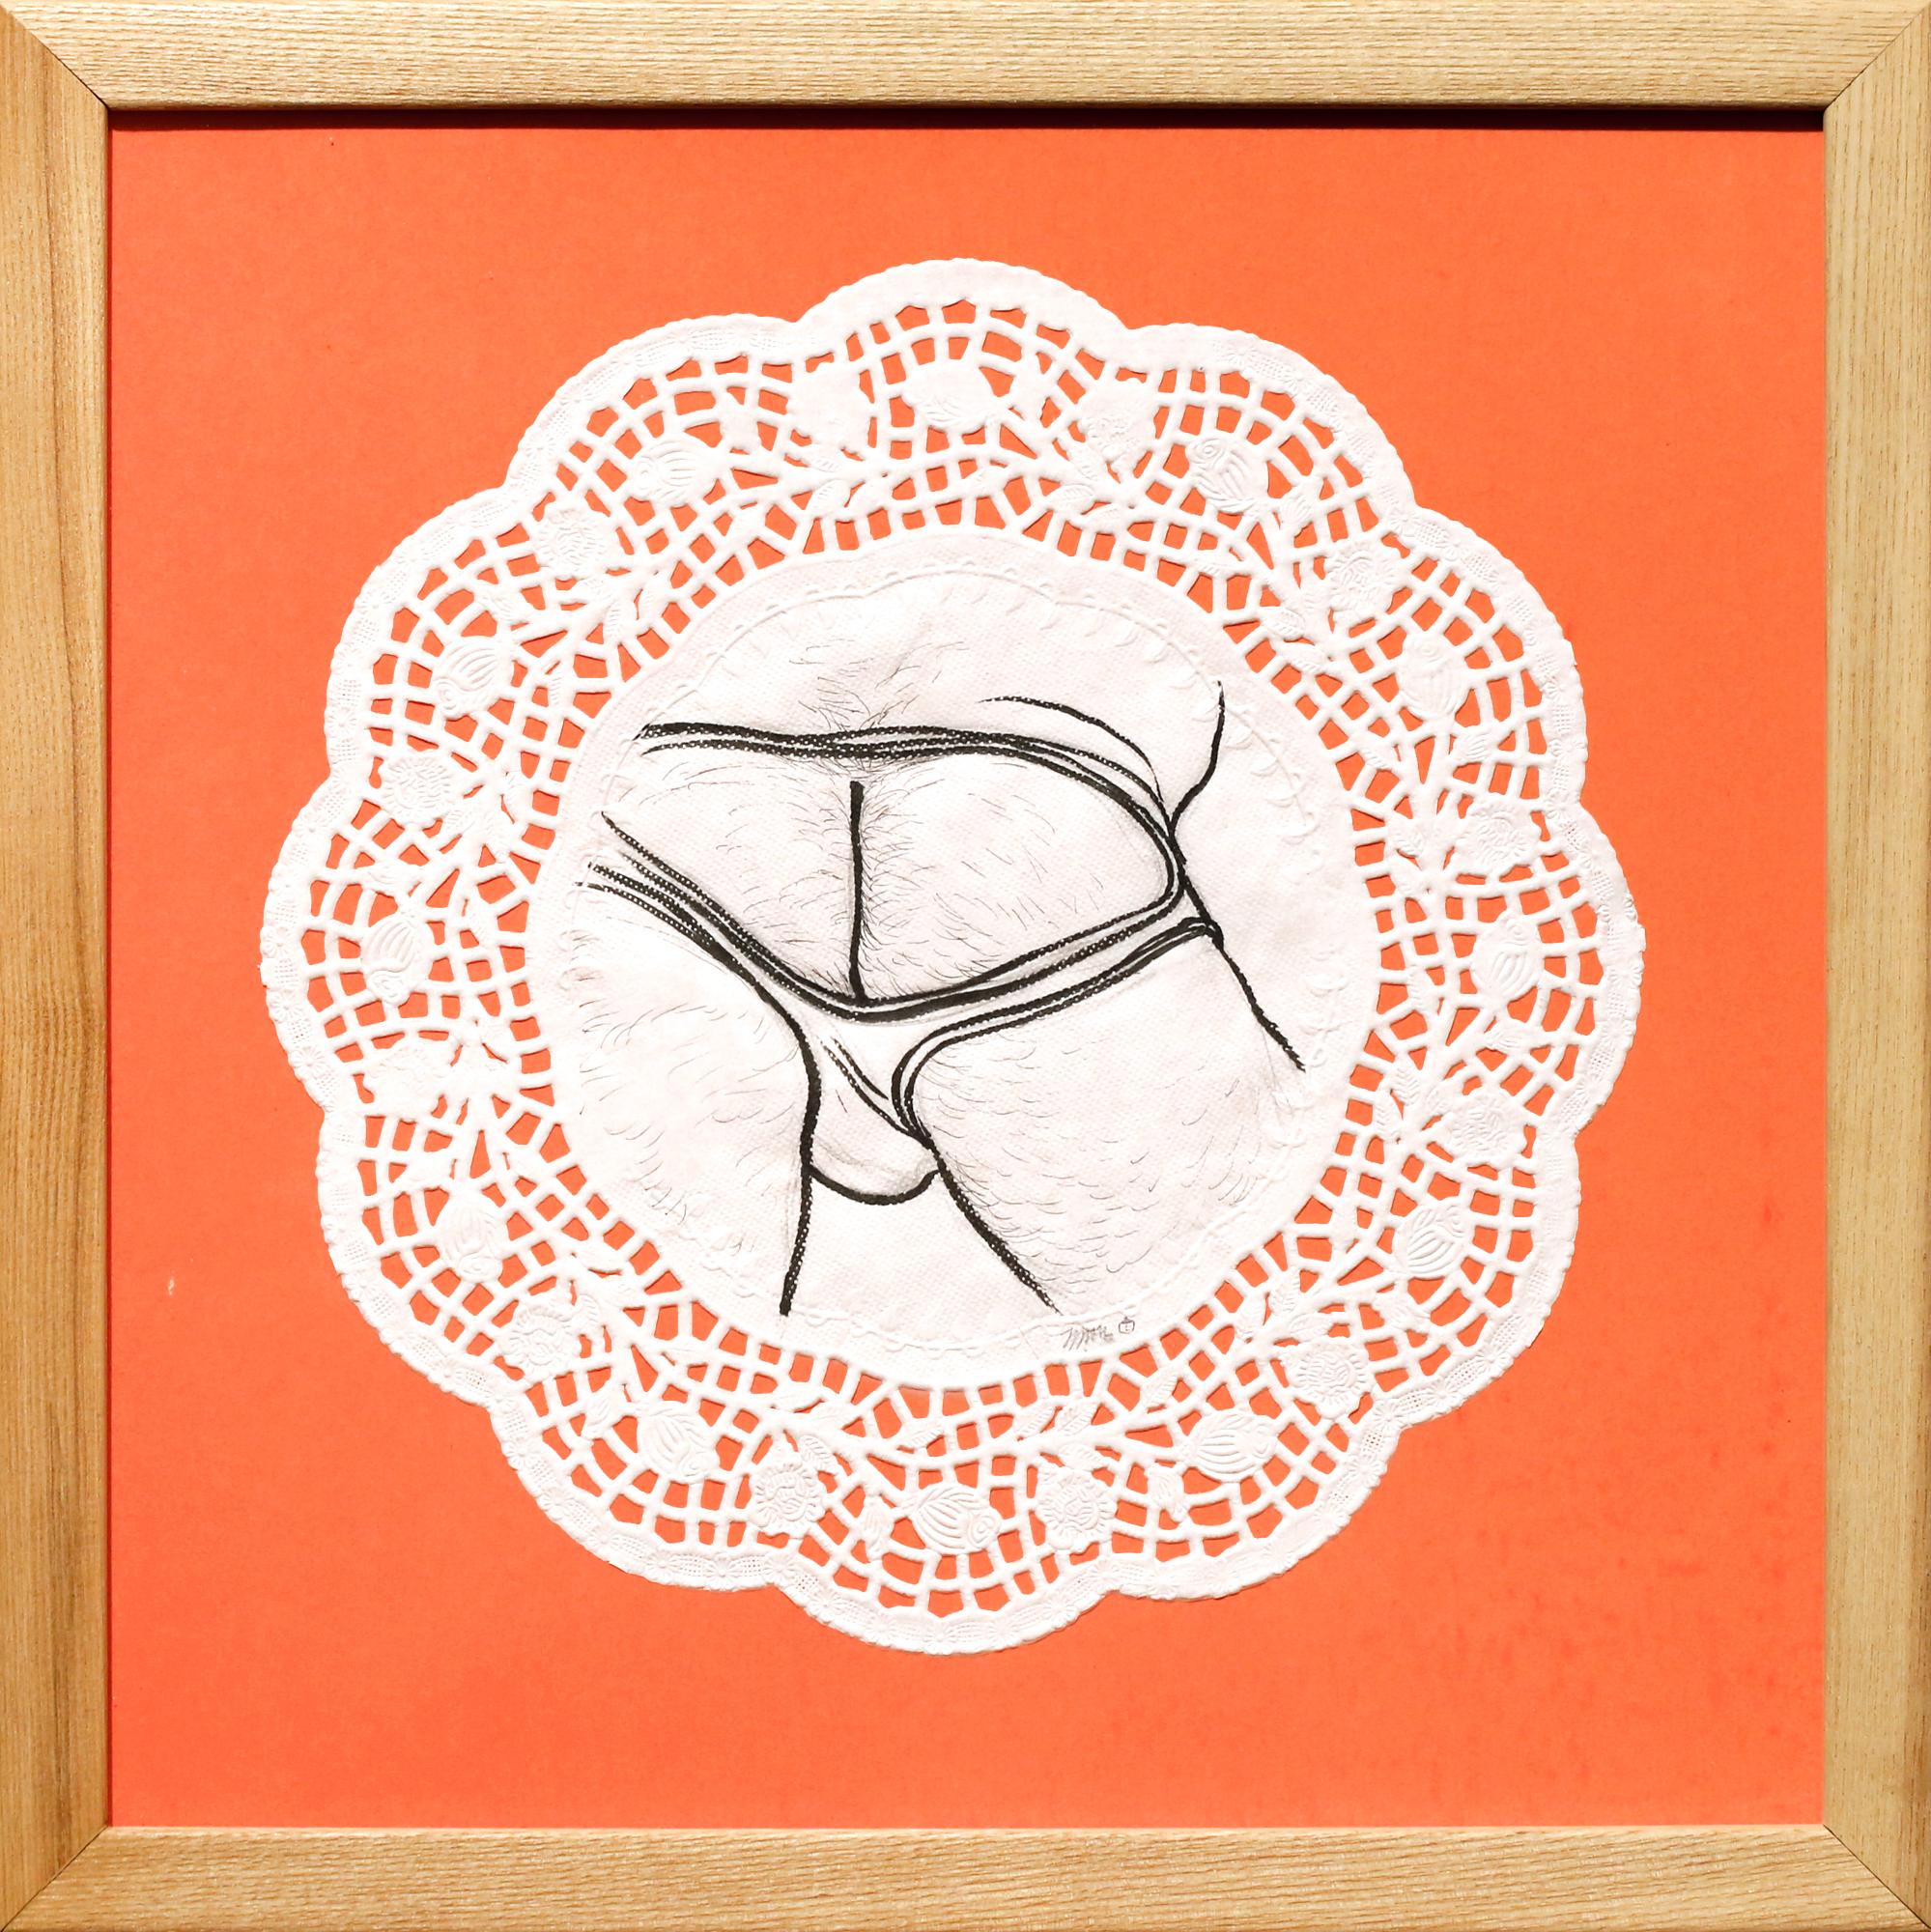 Paradigm Gallery - Jasjyot Singh Hans - Tea _ Cake II - Ink on doily mounted on screenprint - 13.25_H x 13.25_W - 2018 - $250.jpg